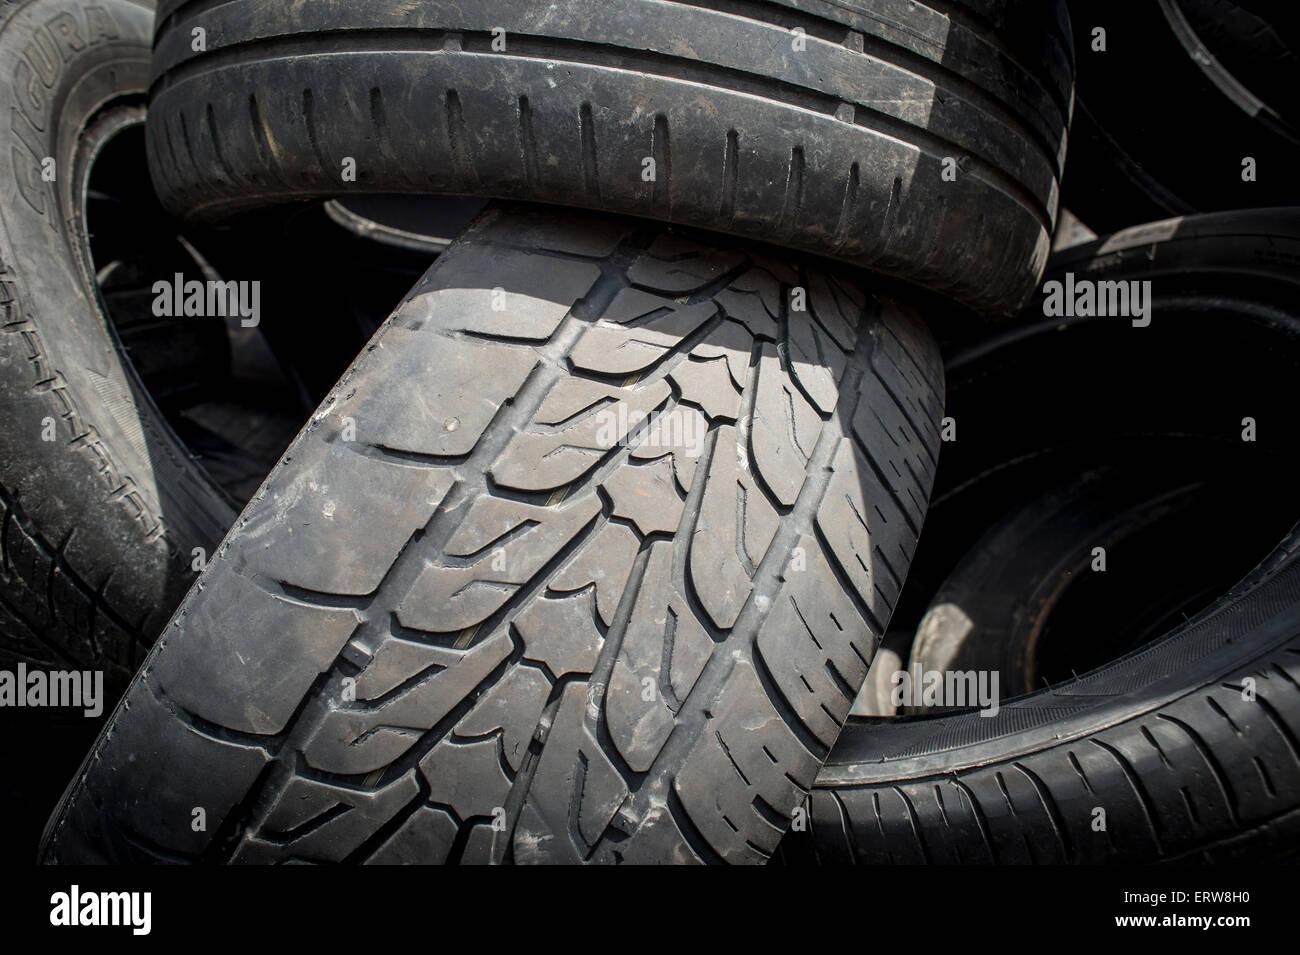 close up of worn car tyres - Stock Image